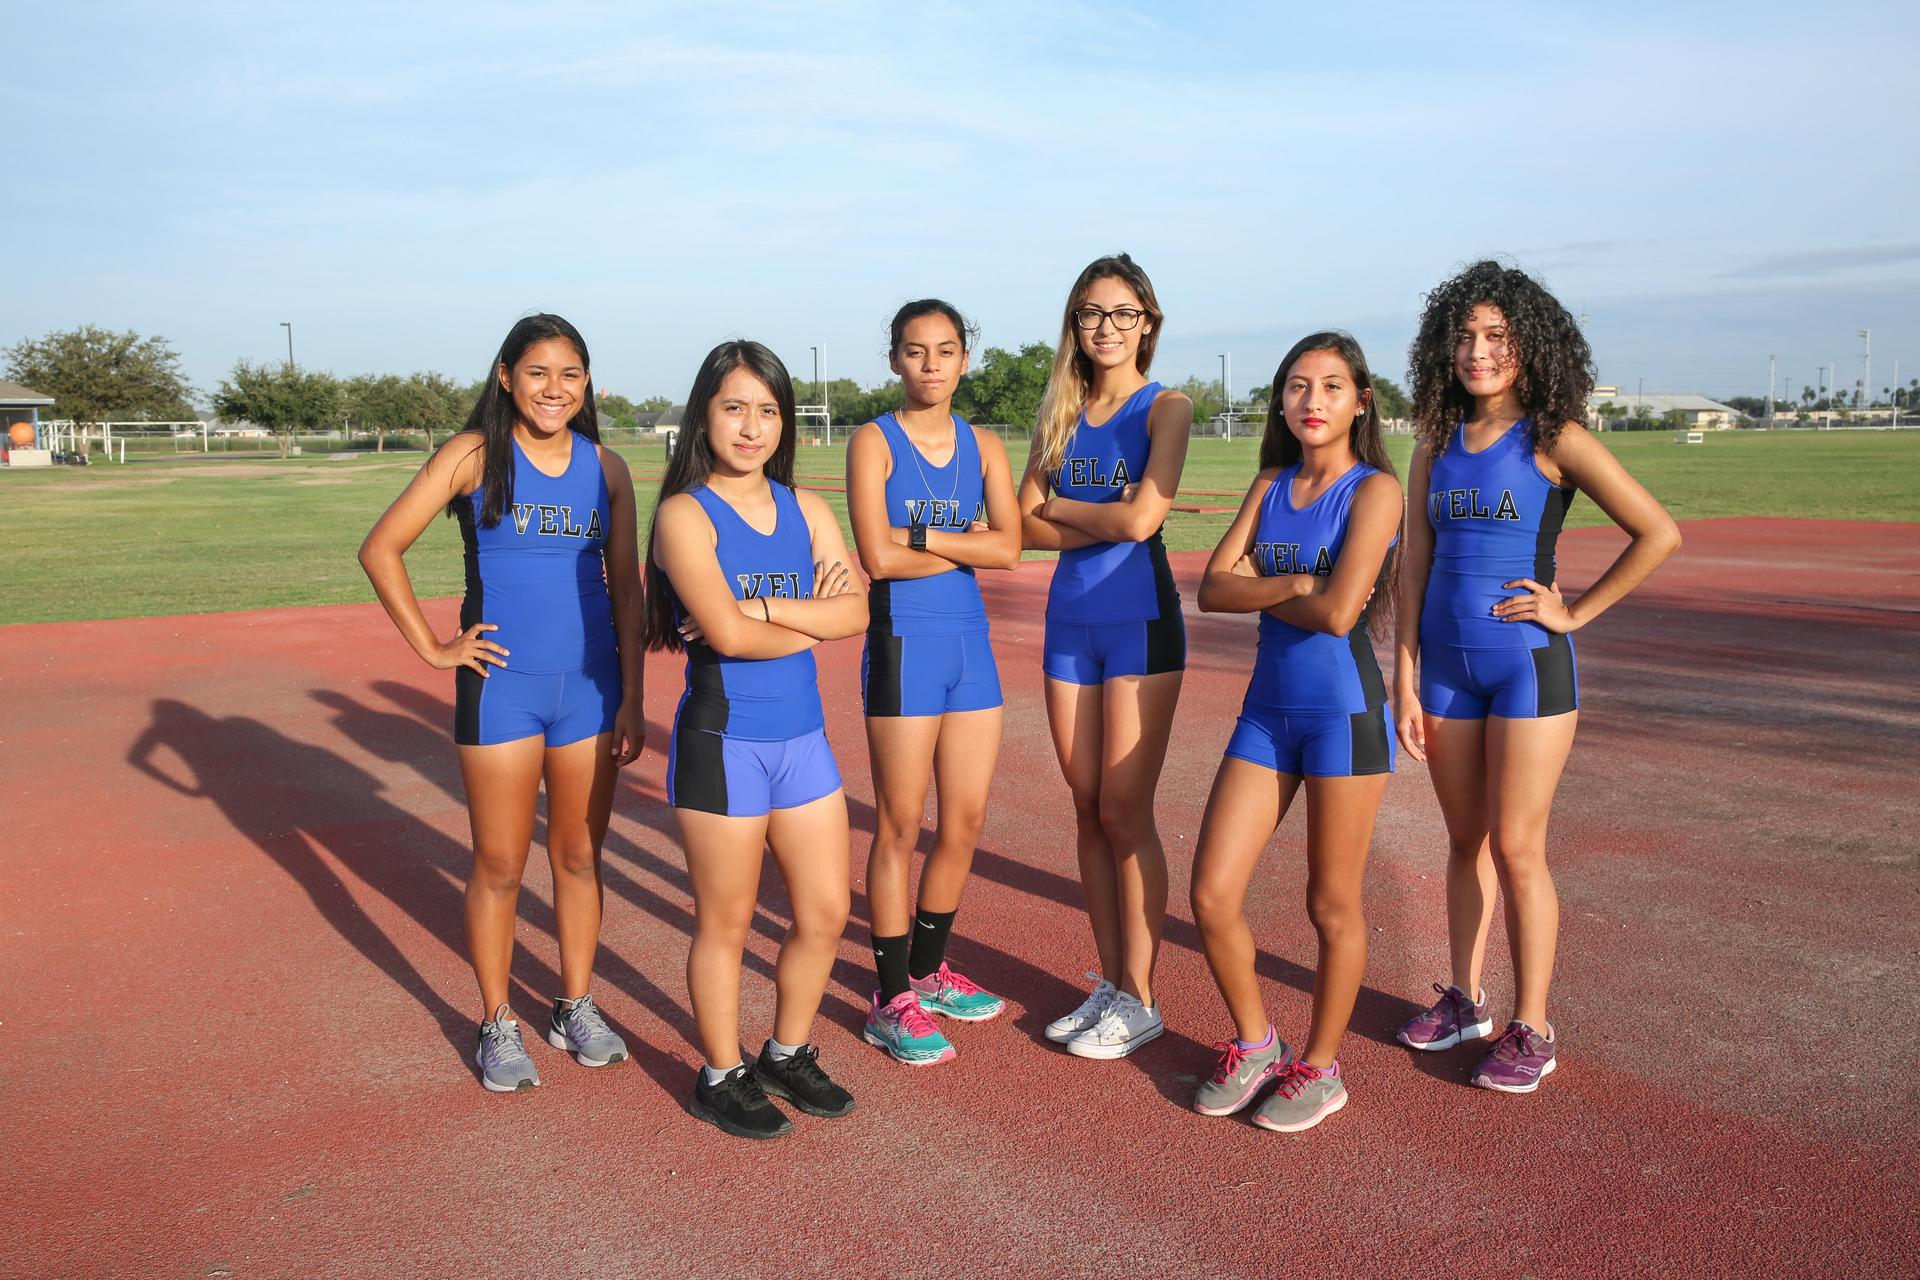 Image of: JV TEAM: Angelisa Diaz, Marisol Ortega, Jasmin Sustaita, Kiara Villegas, Cristina Sanchez, Alaissa Garza